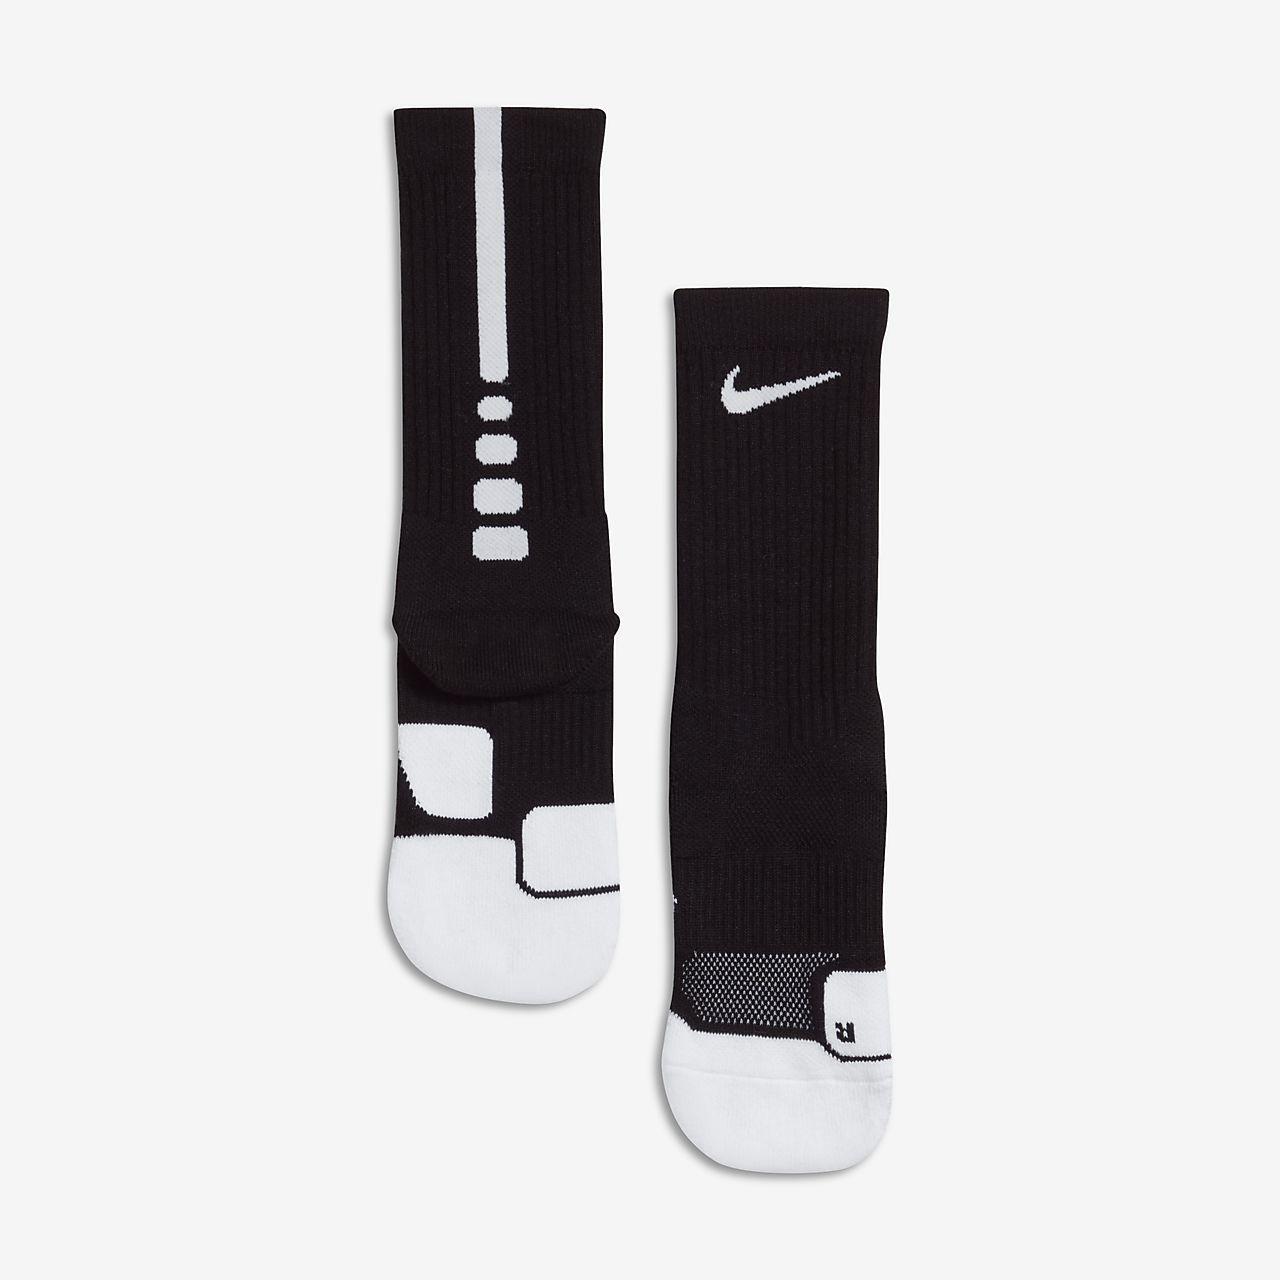 new concept 2ea74 46822 ... Nike Dry Elite 1.5 Crew Basketball Socks